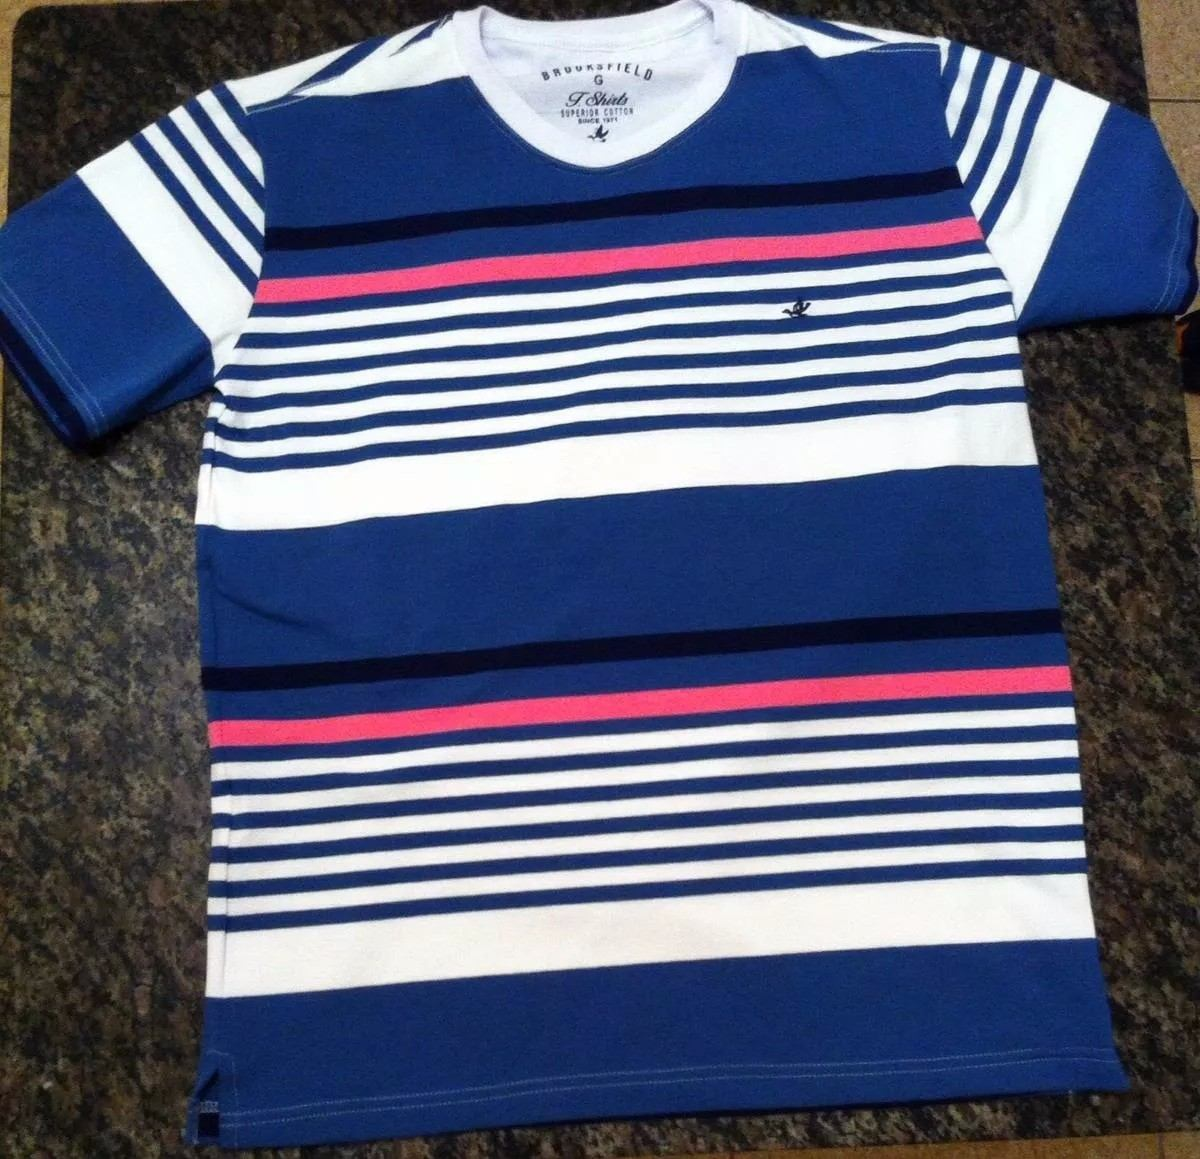 kit 3 camisetas brooks listradas. Carregando zoom. dfbe774aea30d